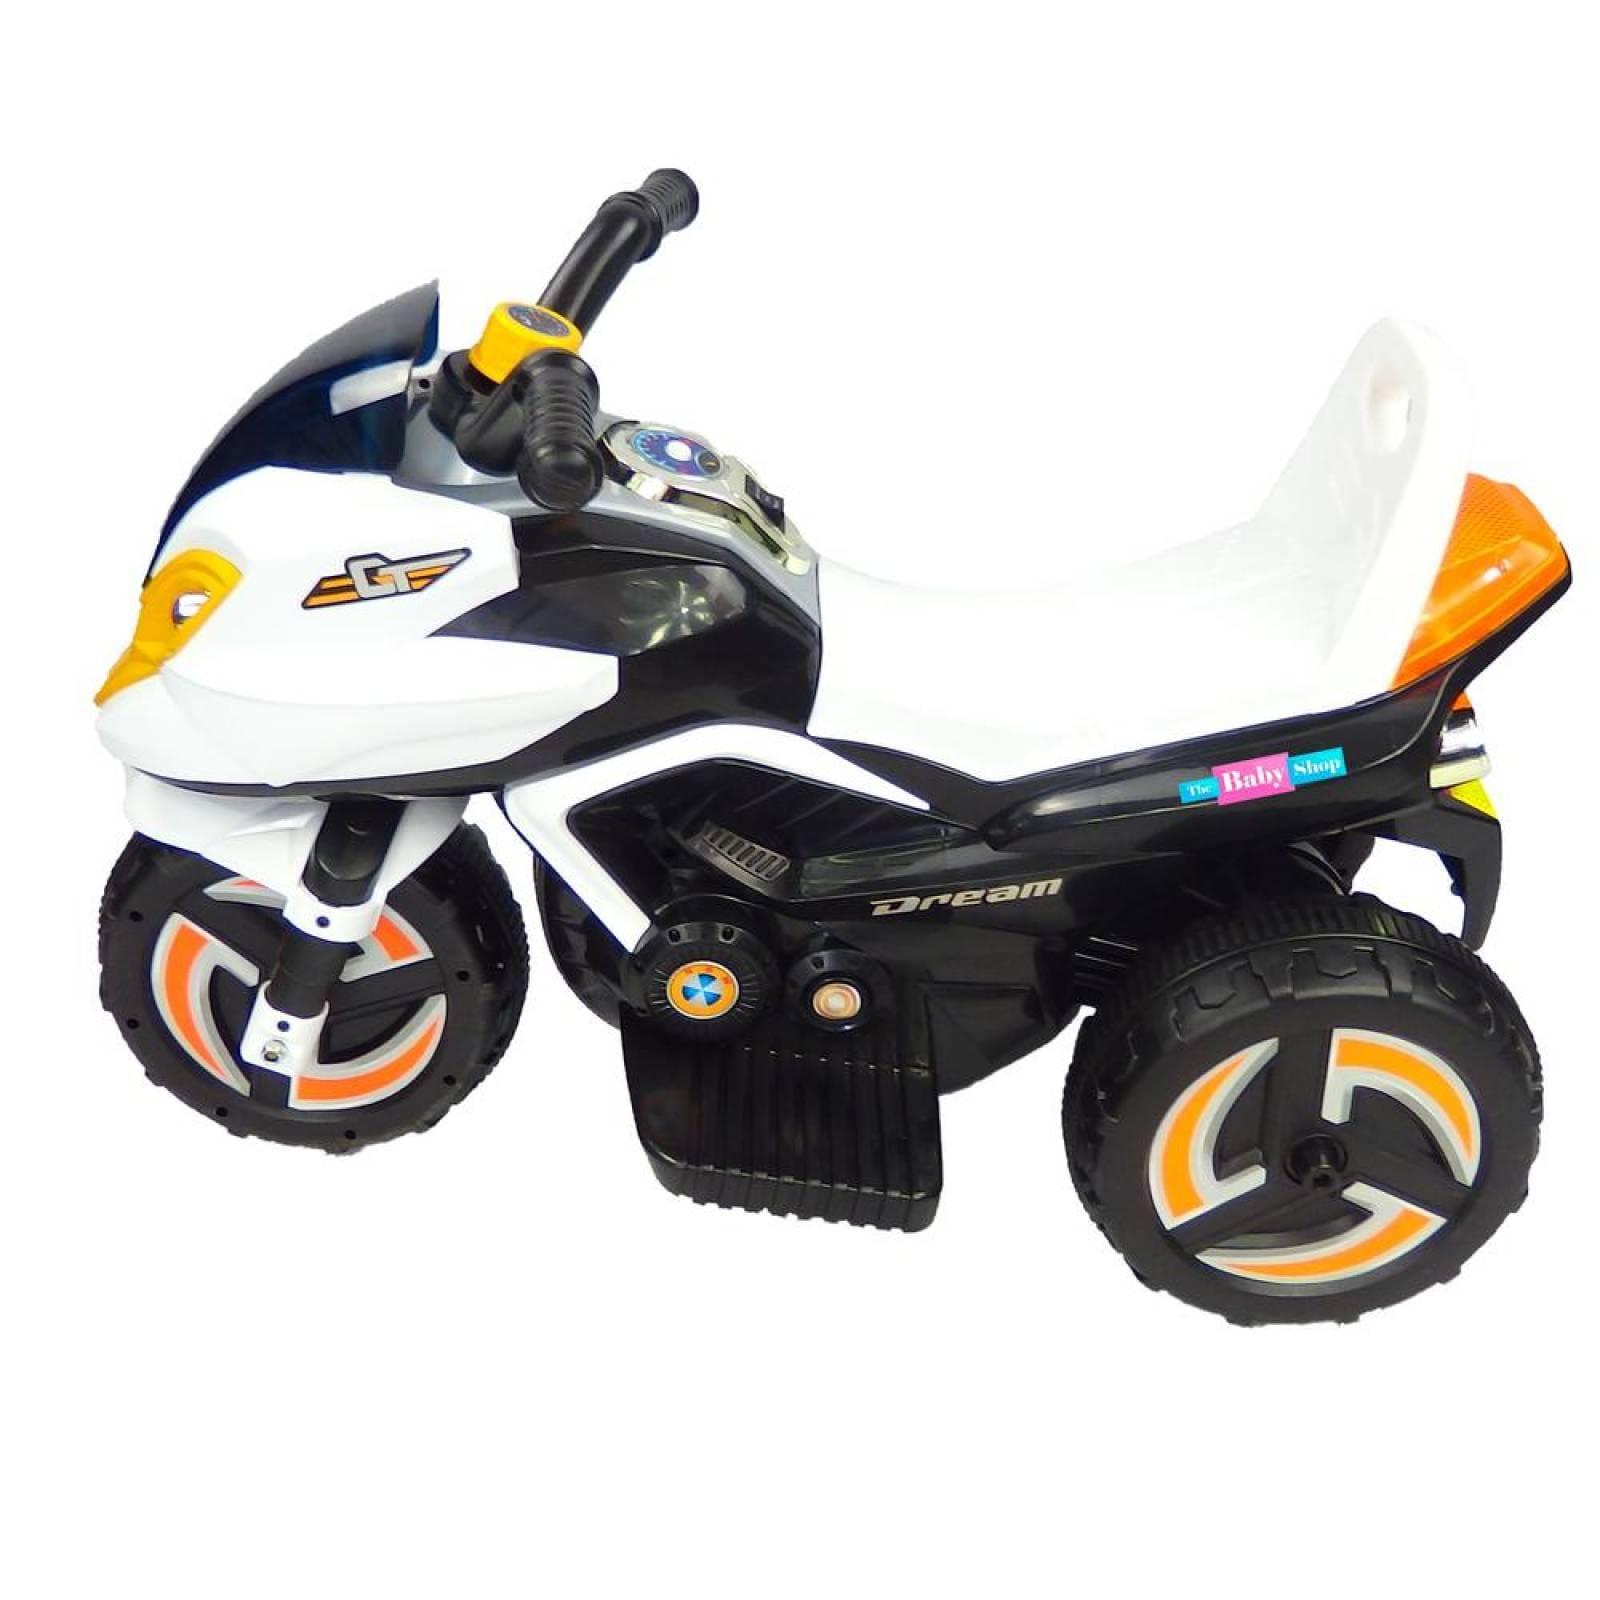 Moto Electrica Musical Infantil Montable LED 6V MSI 35 años Blanco